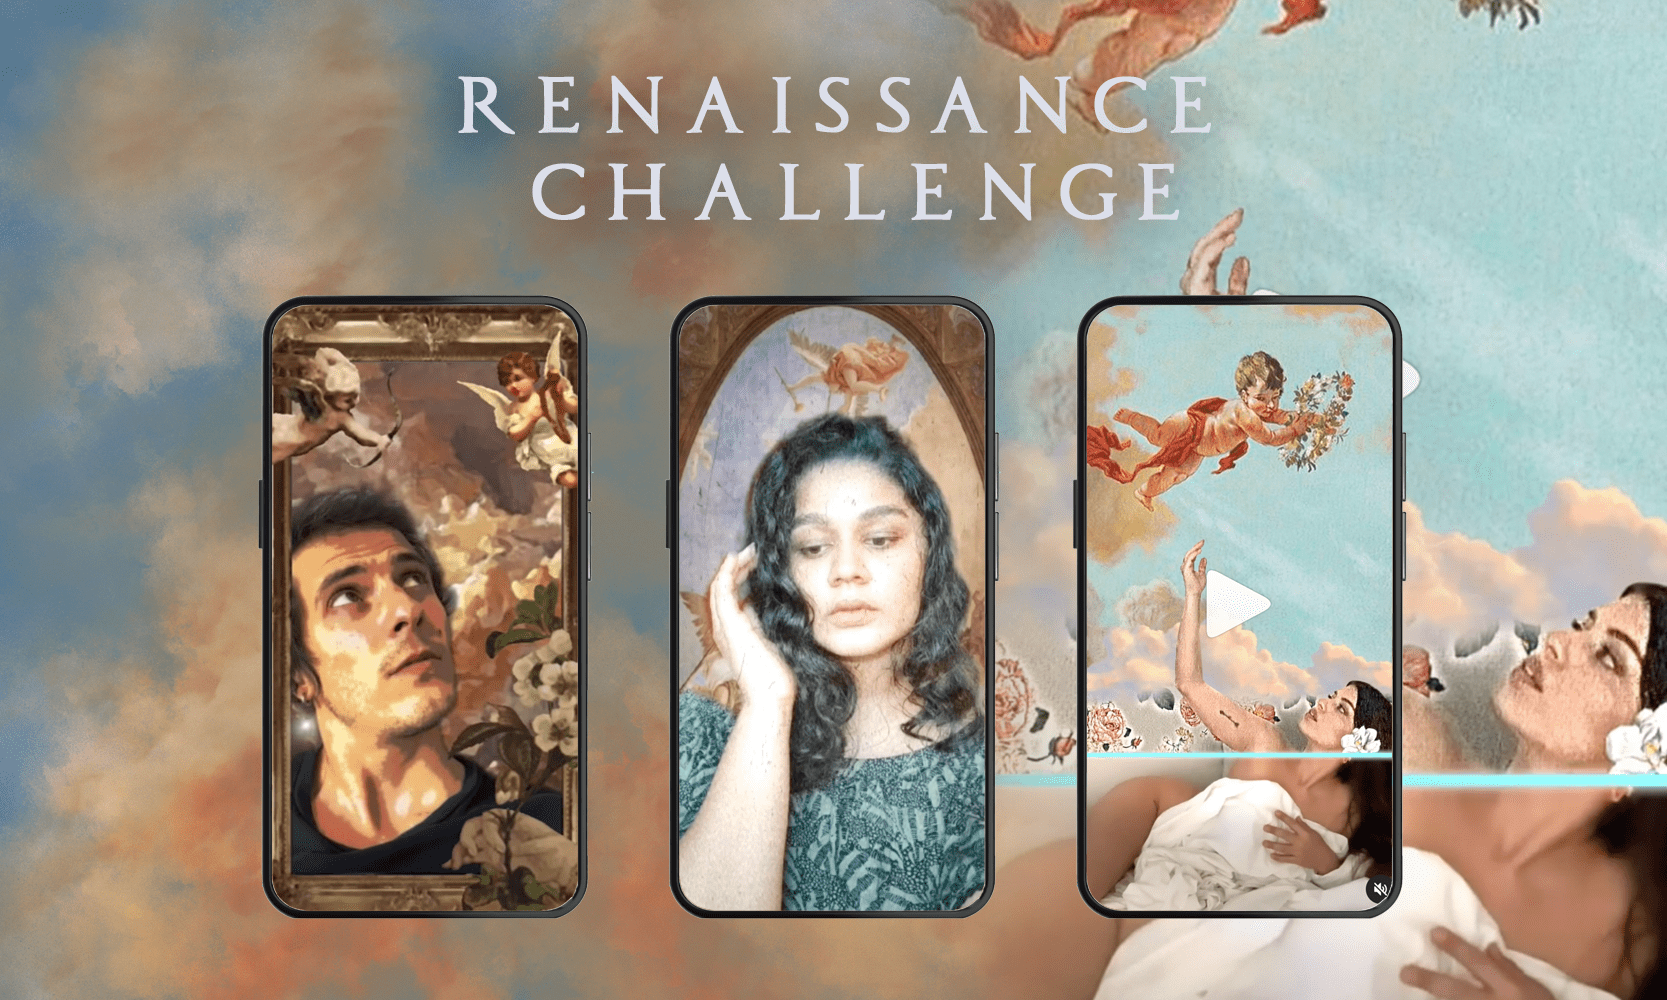 Renaissance Challenge